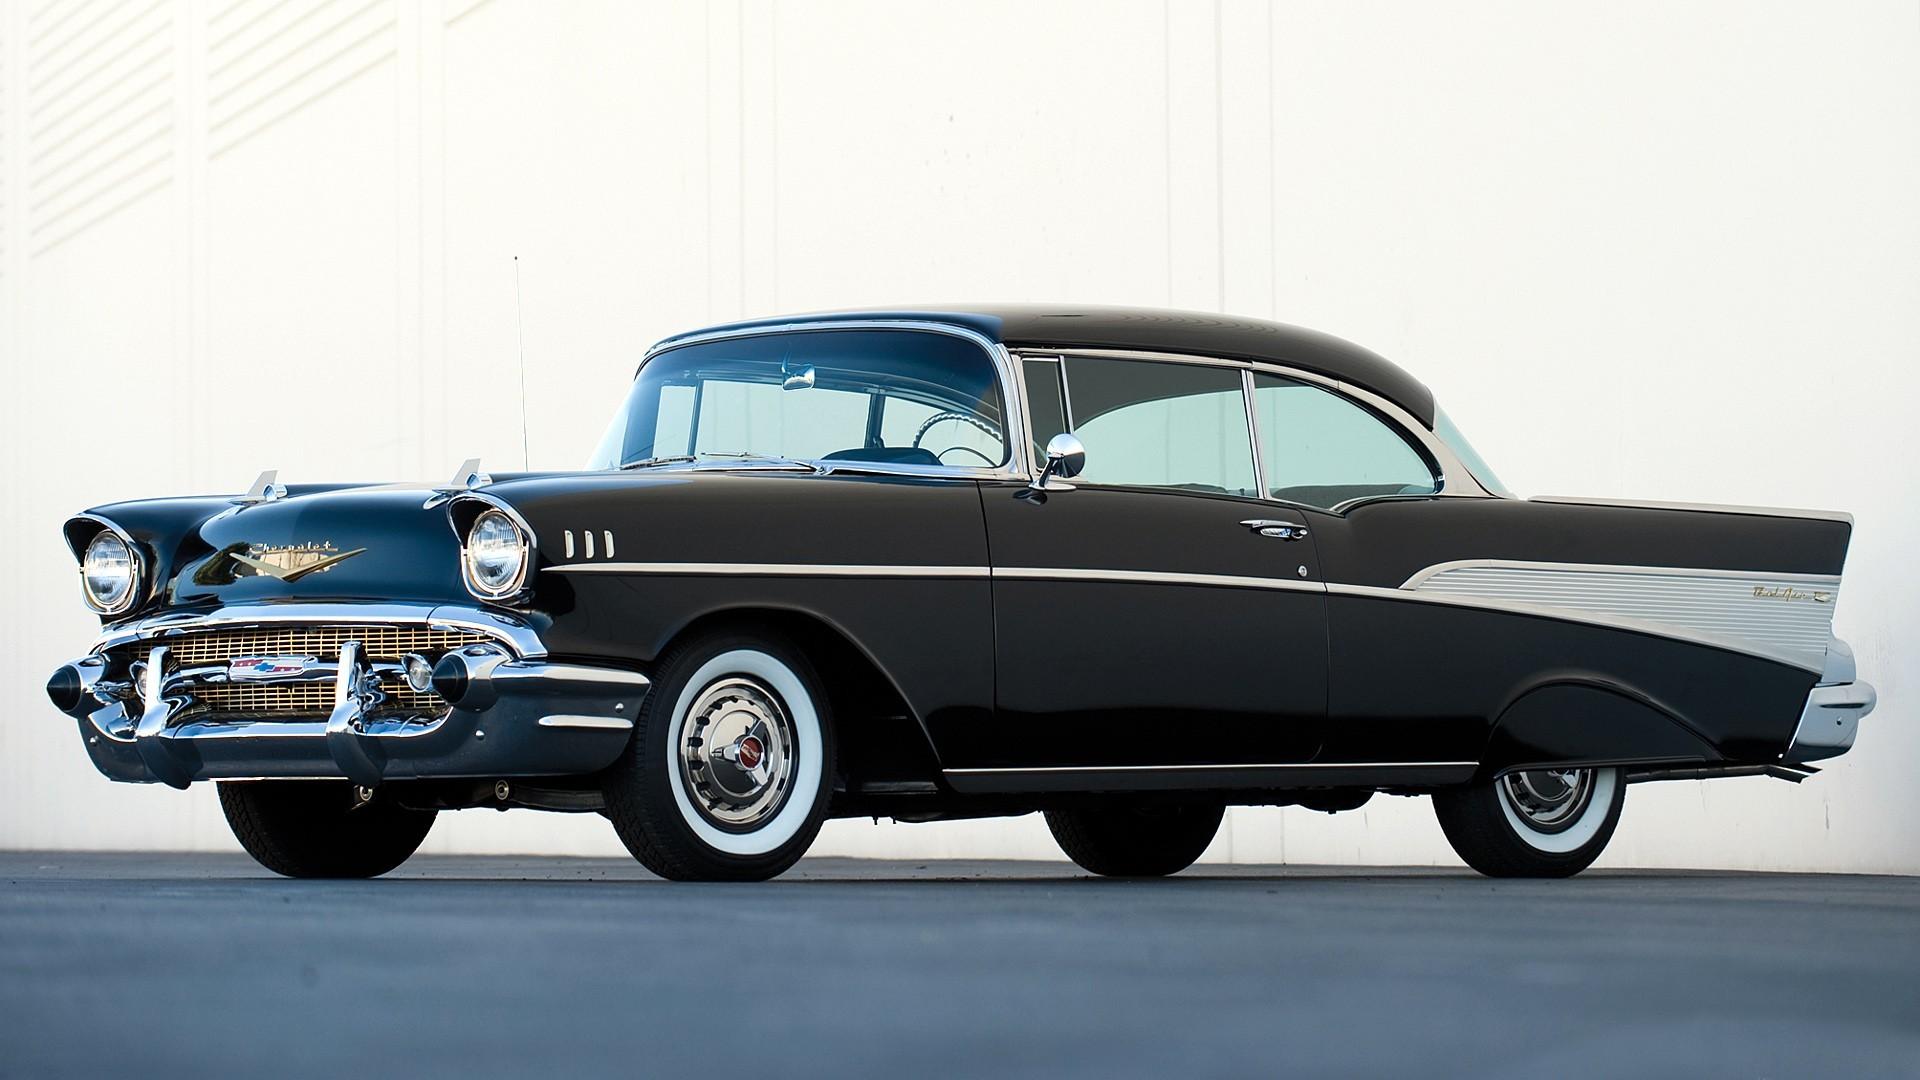 Chevrolet Wallpaper For Windows #uOz | Cars | Pinterest | Chevrolet and Cars